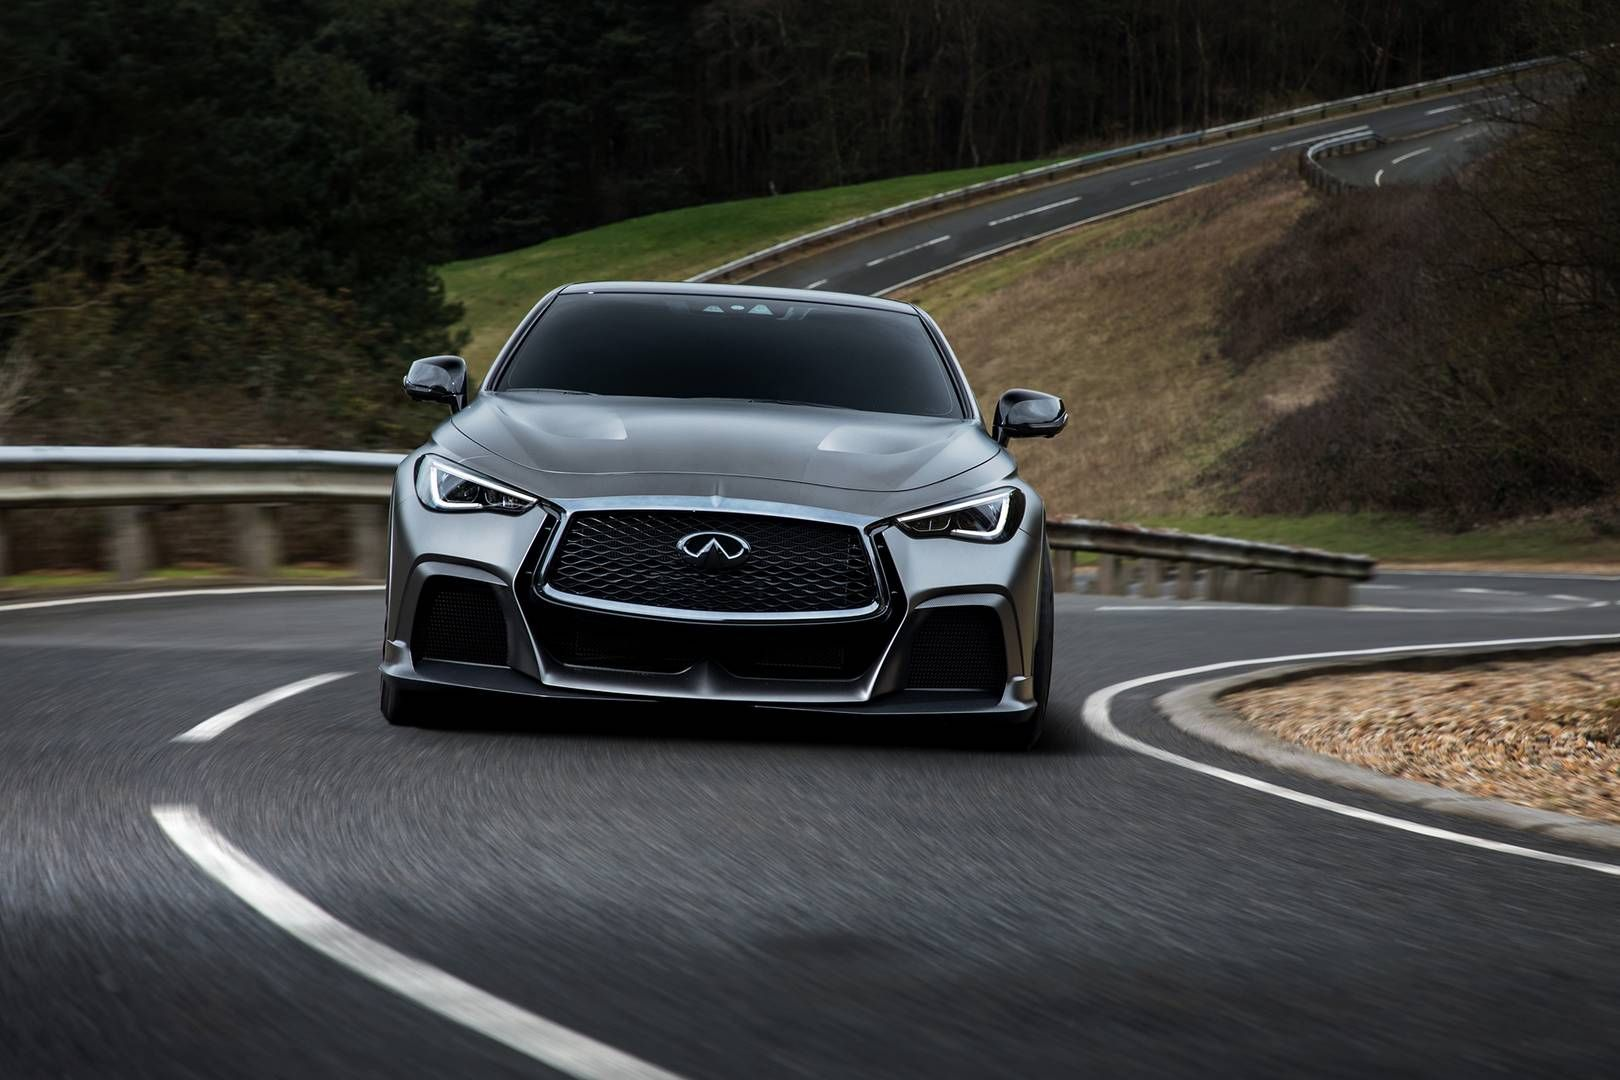 2020 Infiniti Q60 Black S Wallpaper En 2020 Luxury Sports Cars Autos Y Motos Nissan